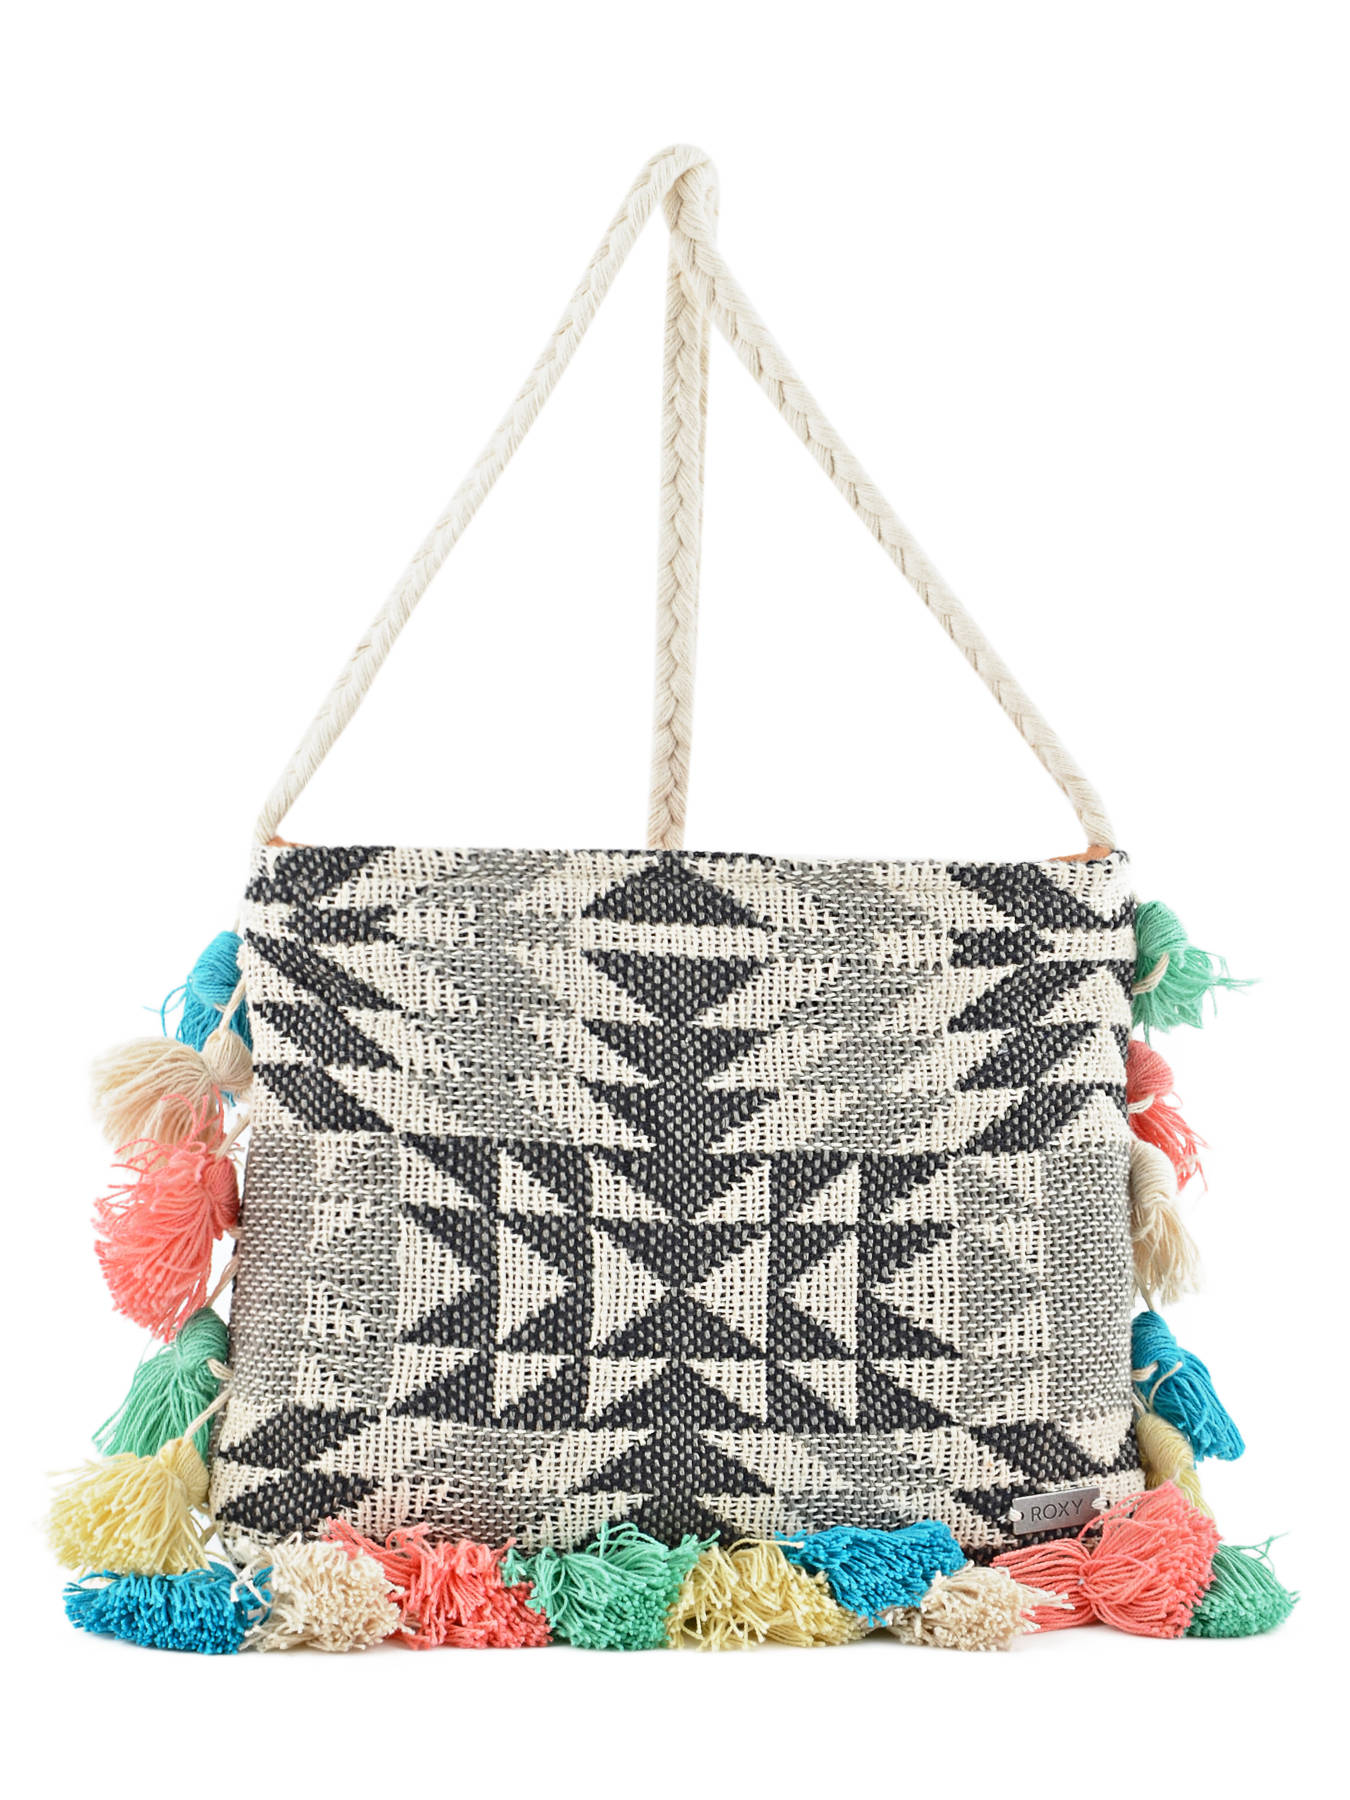 roxy bag accessories best prices. Black Bedroom Furniture Sets. Home Design Ideas